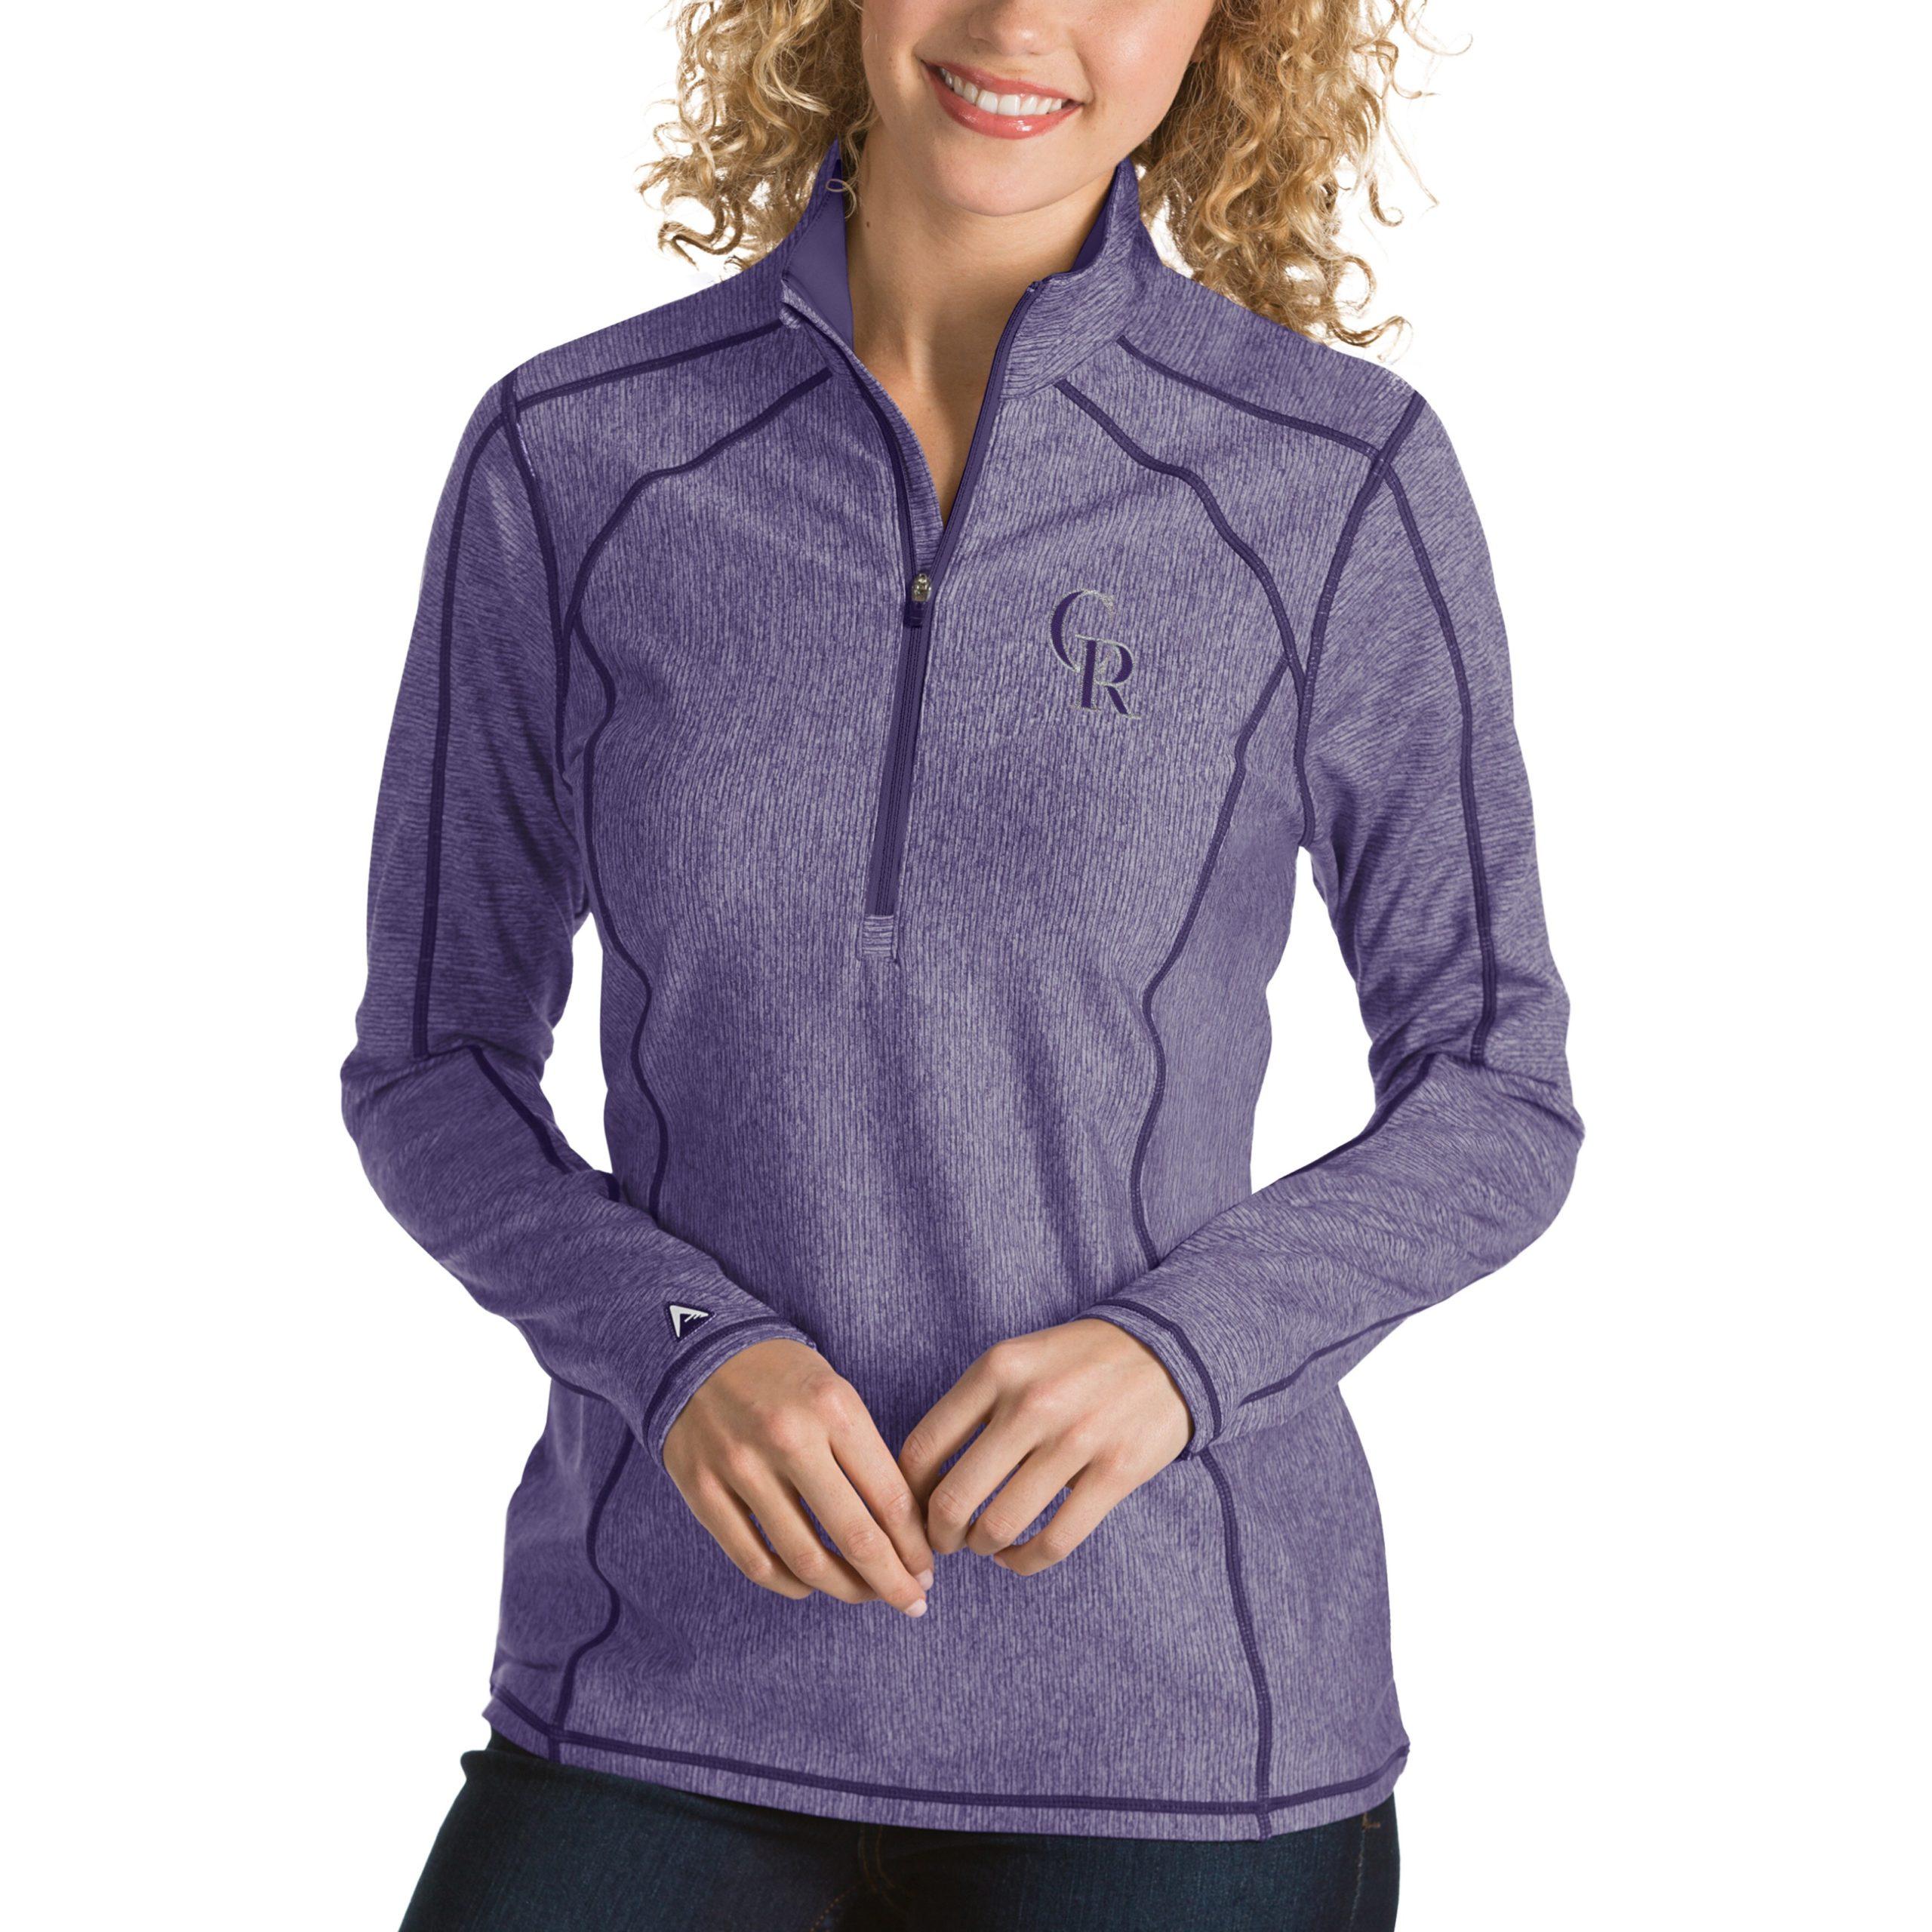 Colorado Rockies Antigua Women's Tempo Desert Dry 1/4-Zip Pullover Jacket - Heathered Purple